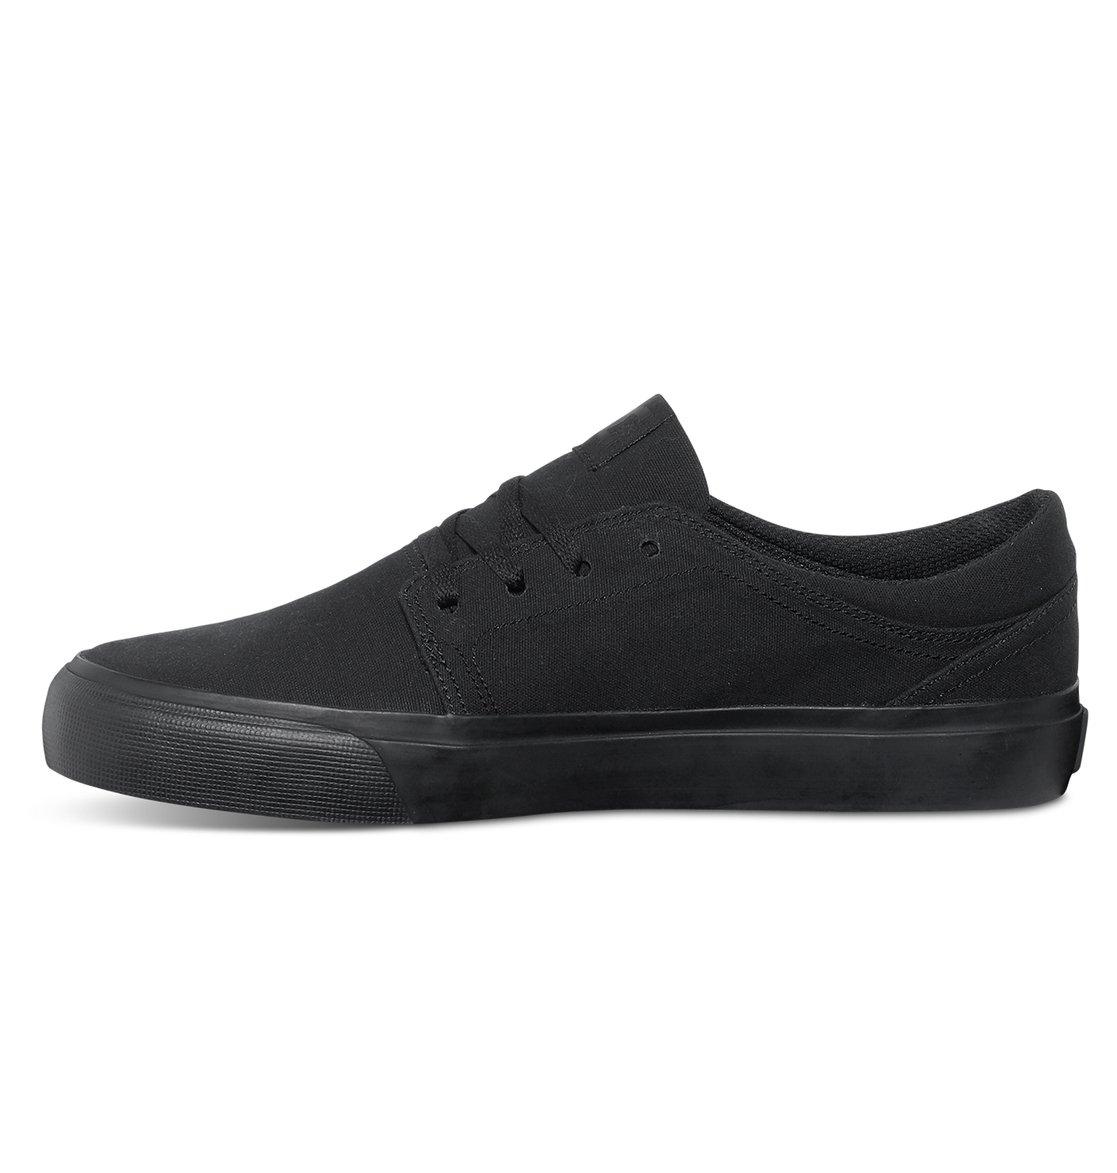 DC Trase TX M Shoe 3BK - Zapatilla Deportiva de Lona Hombre, Color Negro, Talla 41